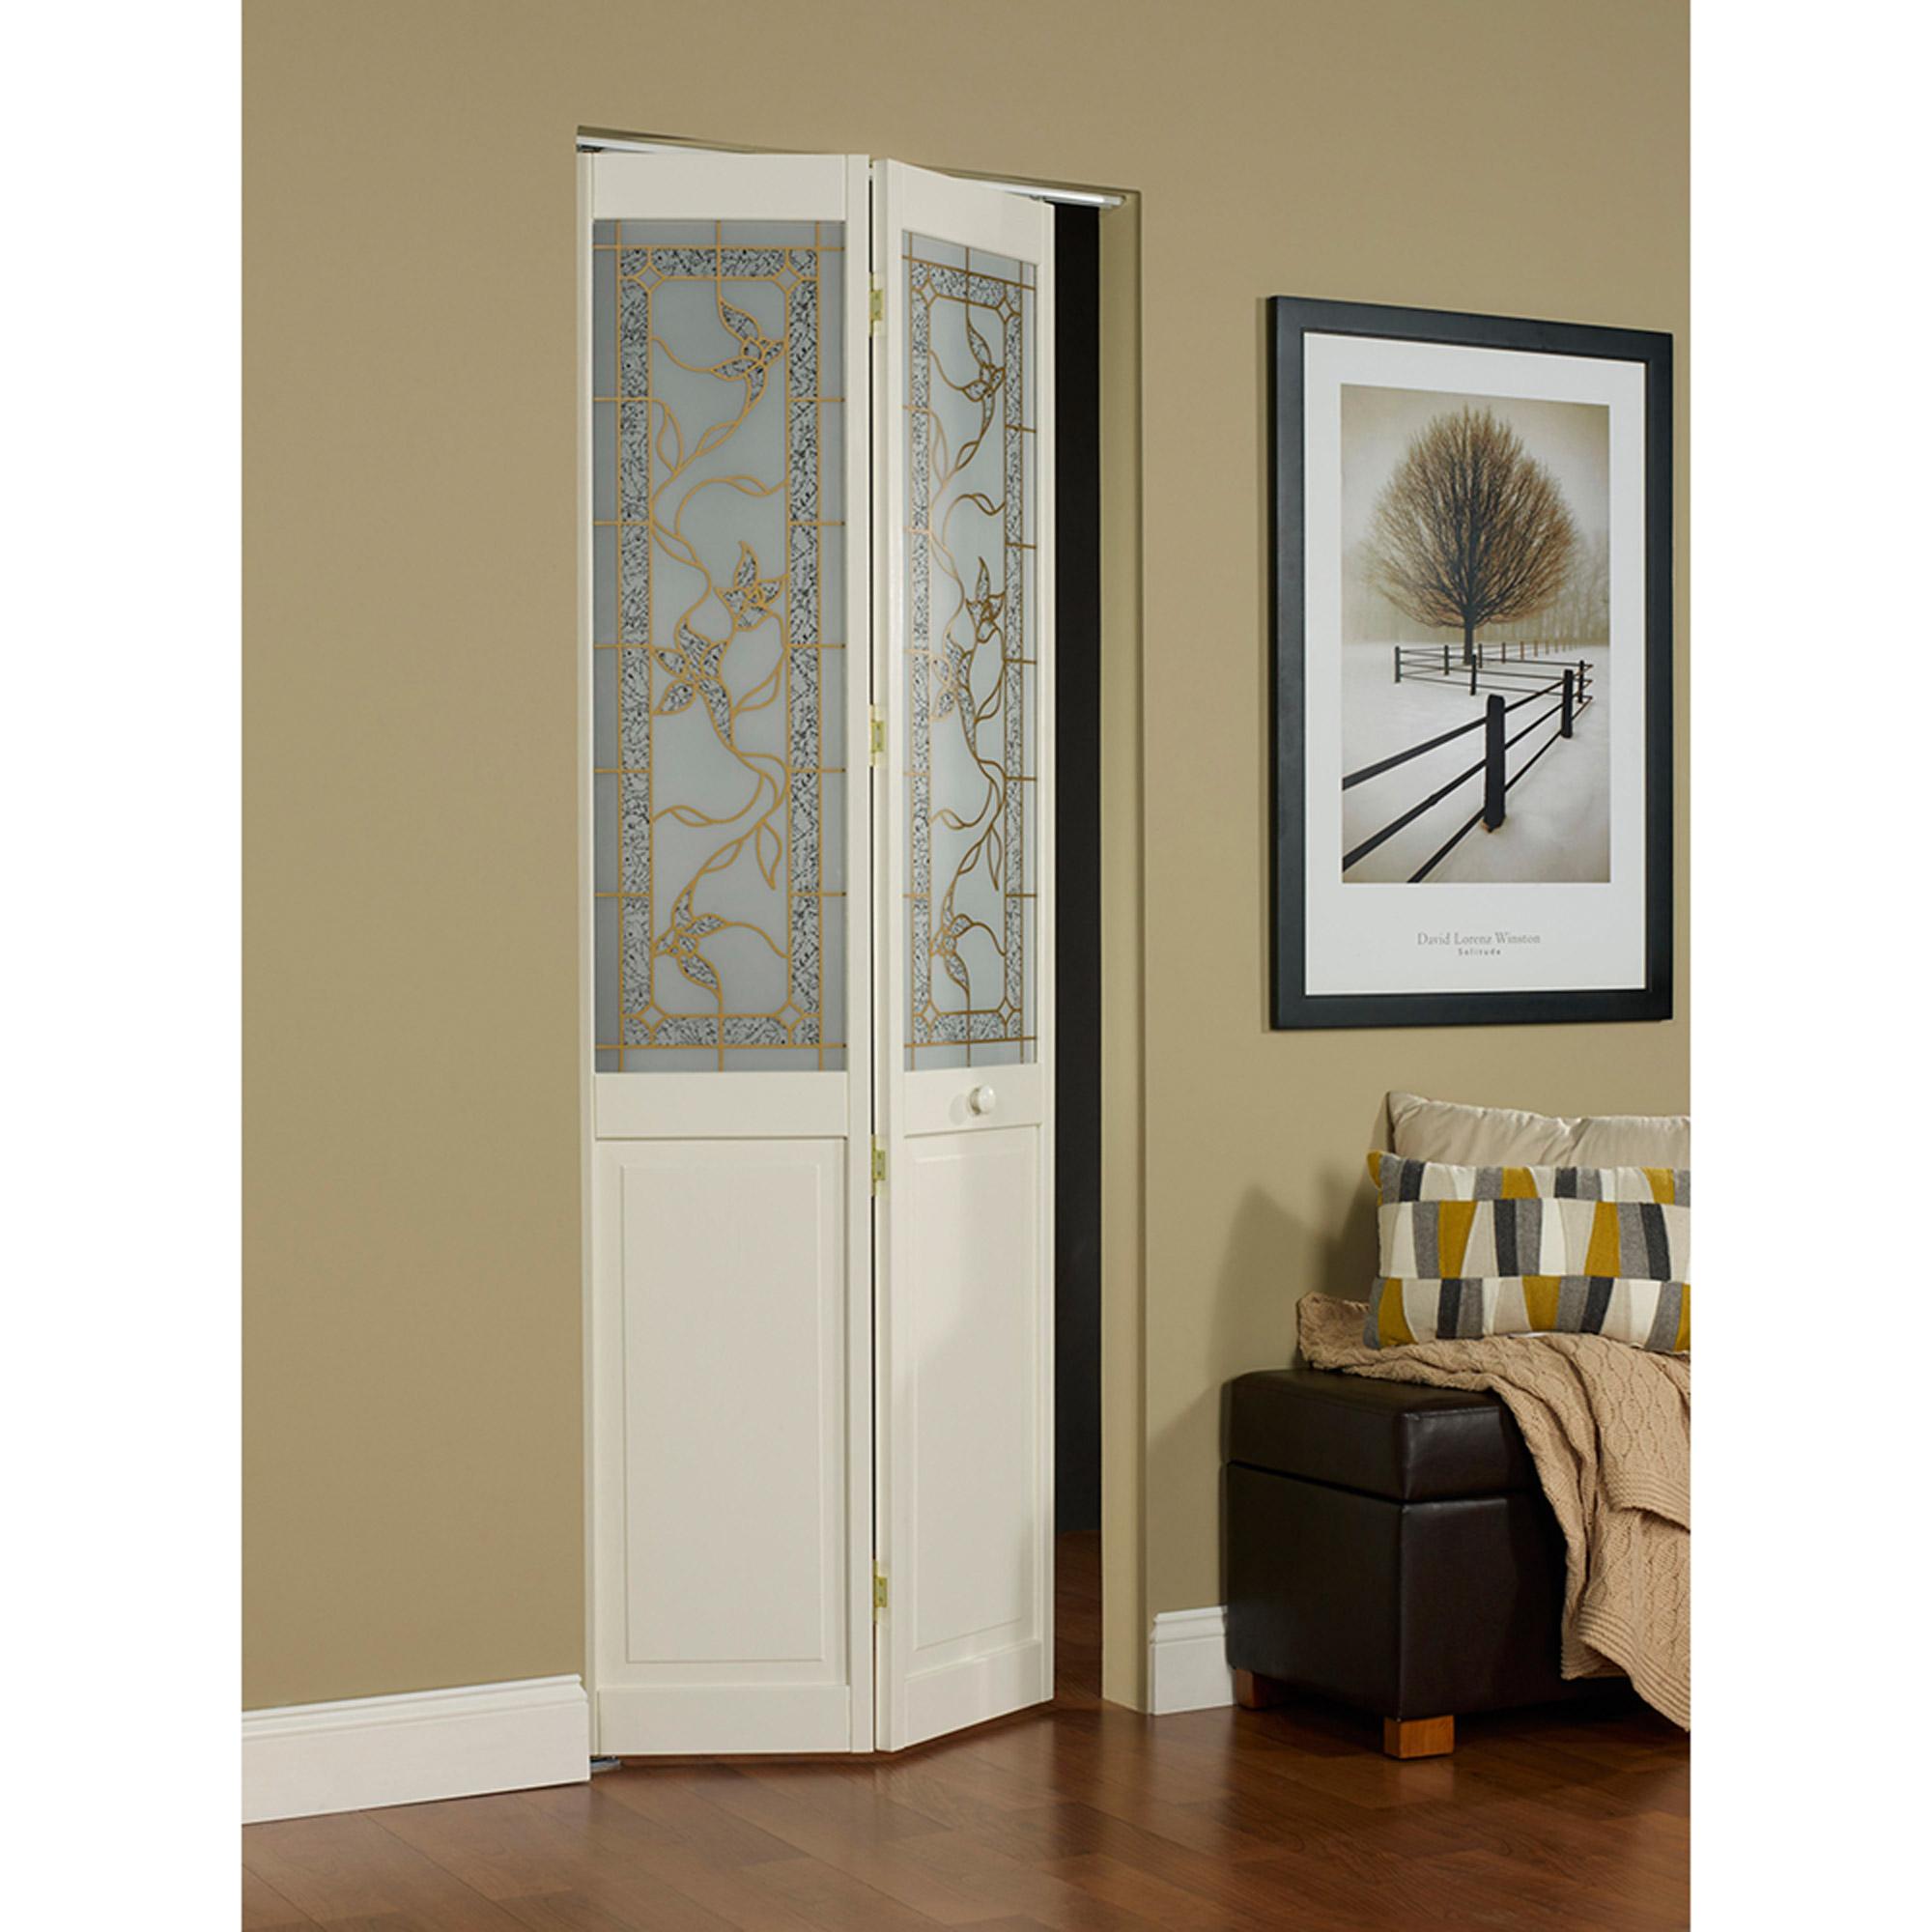 "AWC Giverny Decorative Glass 30"" x 80.5"" Bifold Door"